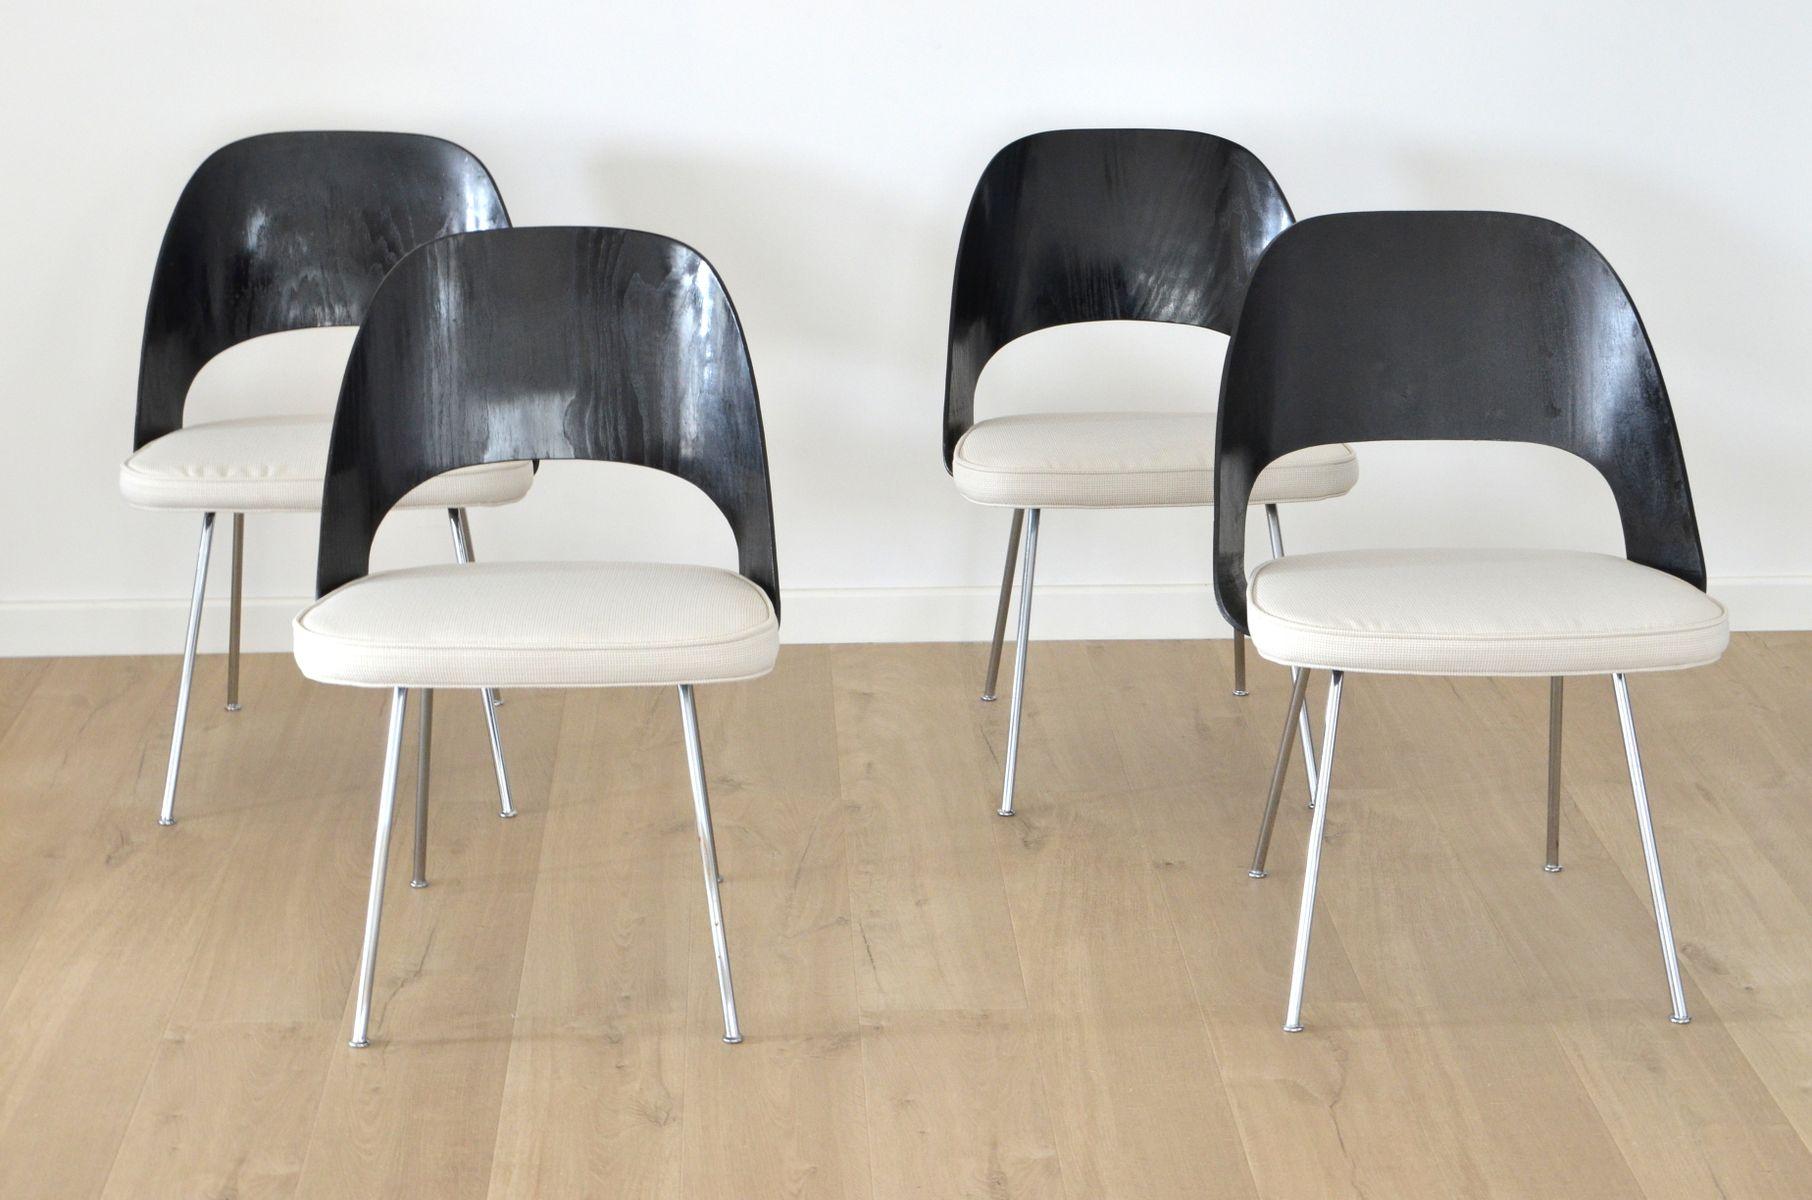 Chaises de salle manger en bois par eero saarinen pour knoll international etats unis 1960s - Tavolo saarinen knoll originale ...